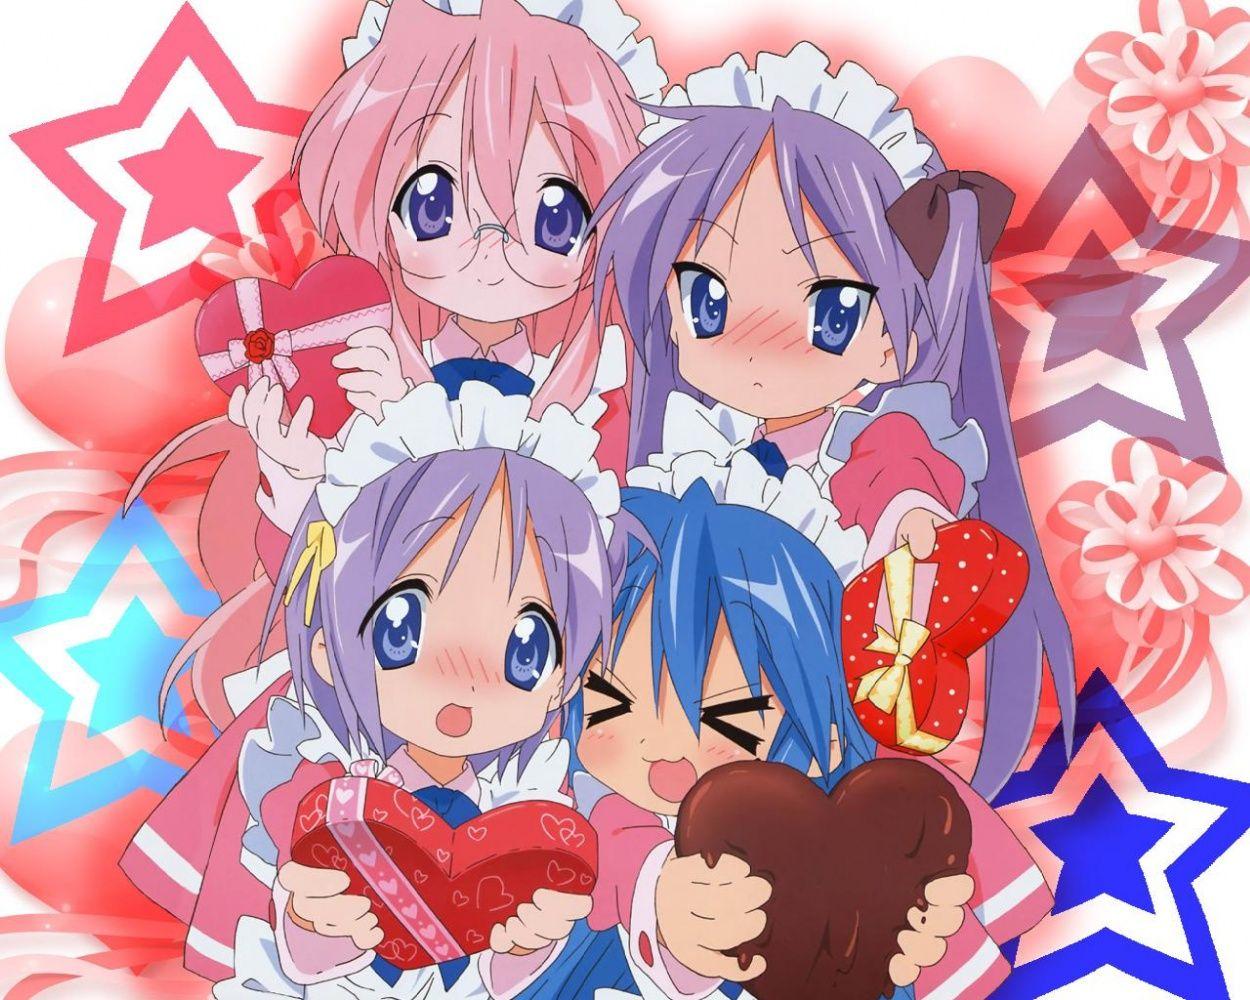 Anime Valentine S Day Valentine S Day Anime Manga Concept